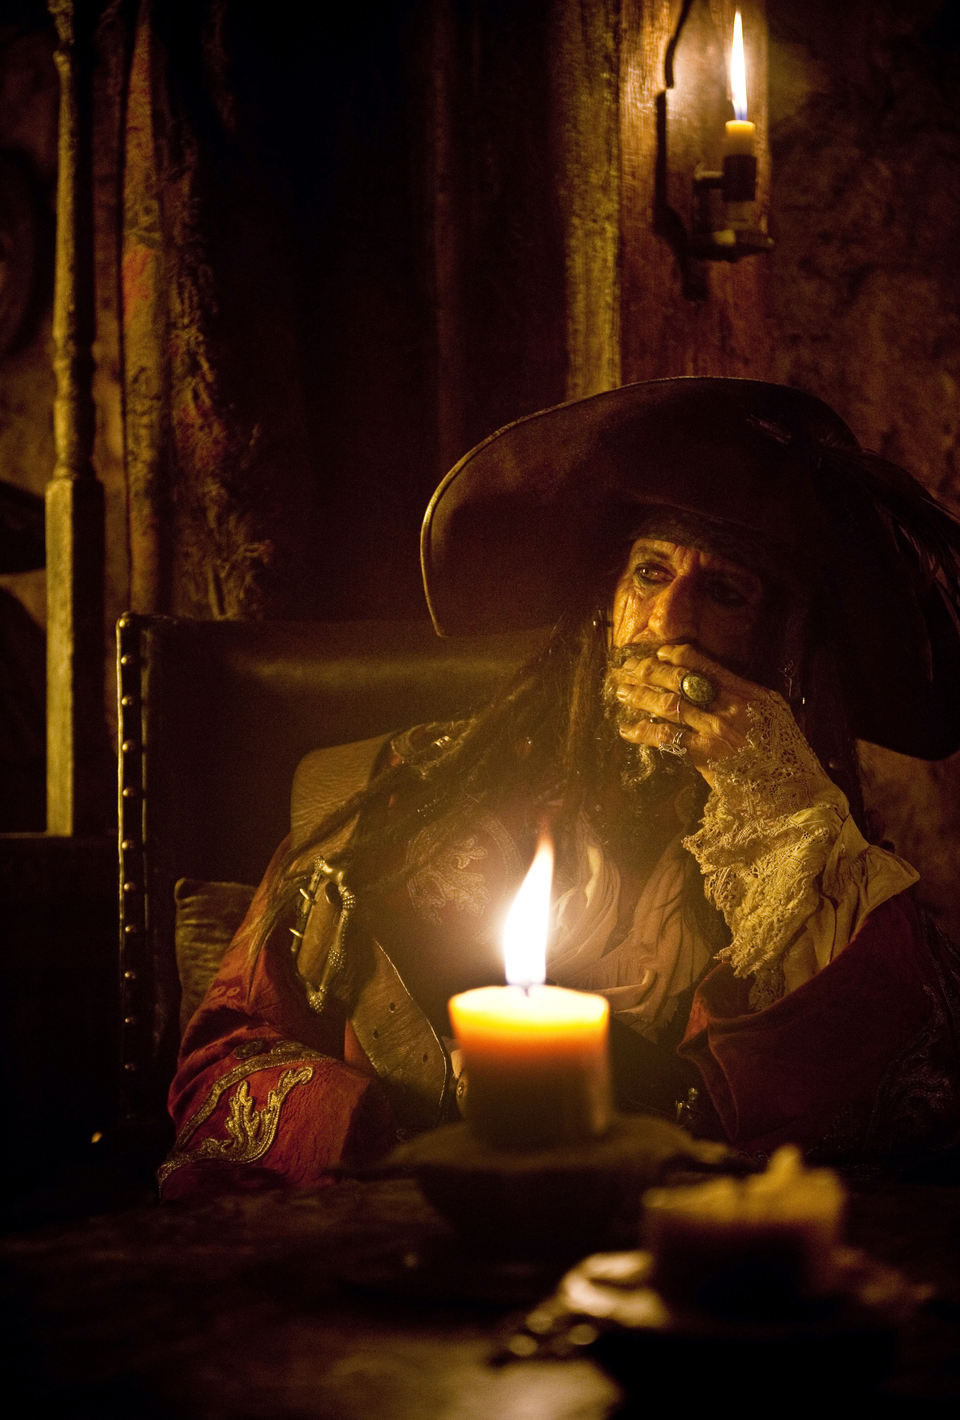 Pirates of the Caribbean: On Stranger Tides, fotograma 61 de 86